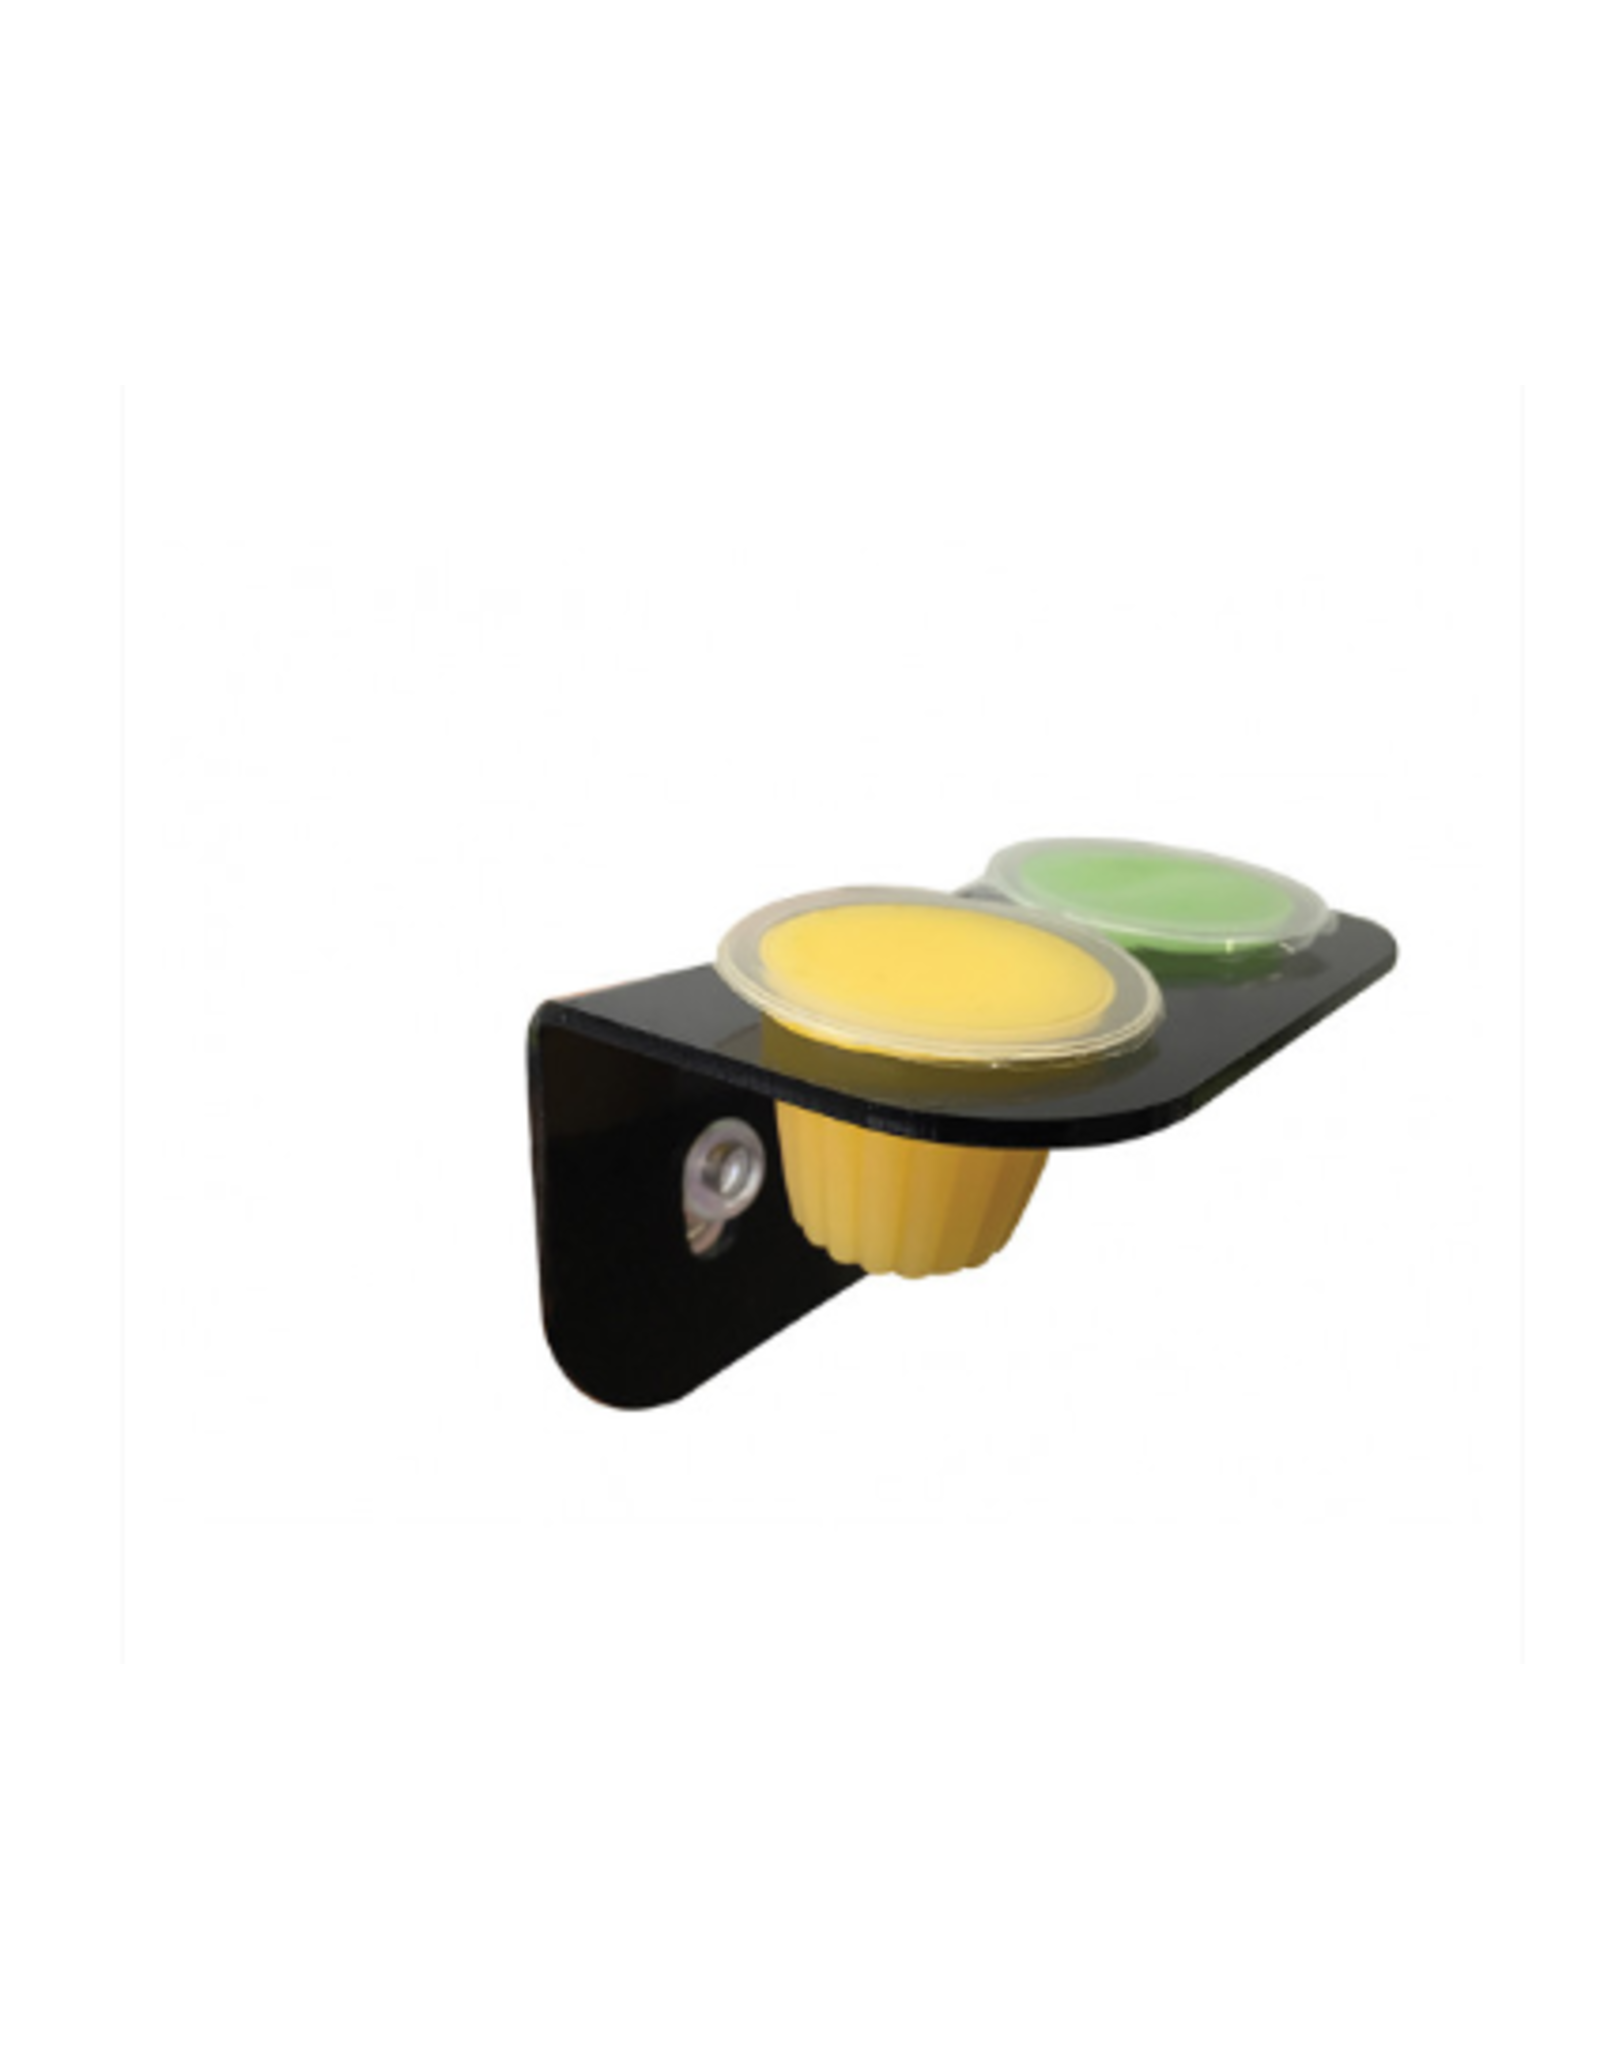 Komodo Komodo Twin Jelly Pot Holder